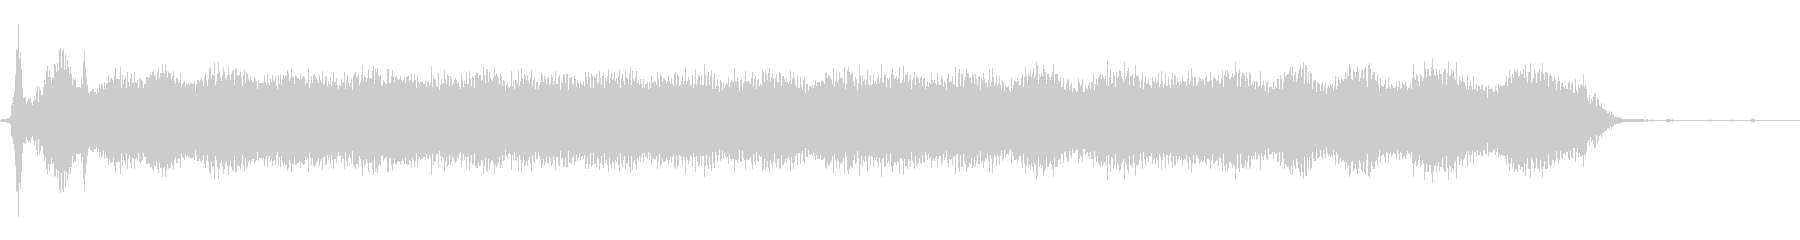 TWIN V12 TURBO 12...の未再生の波形